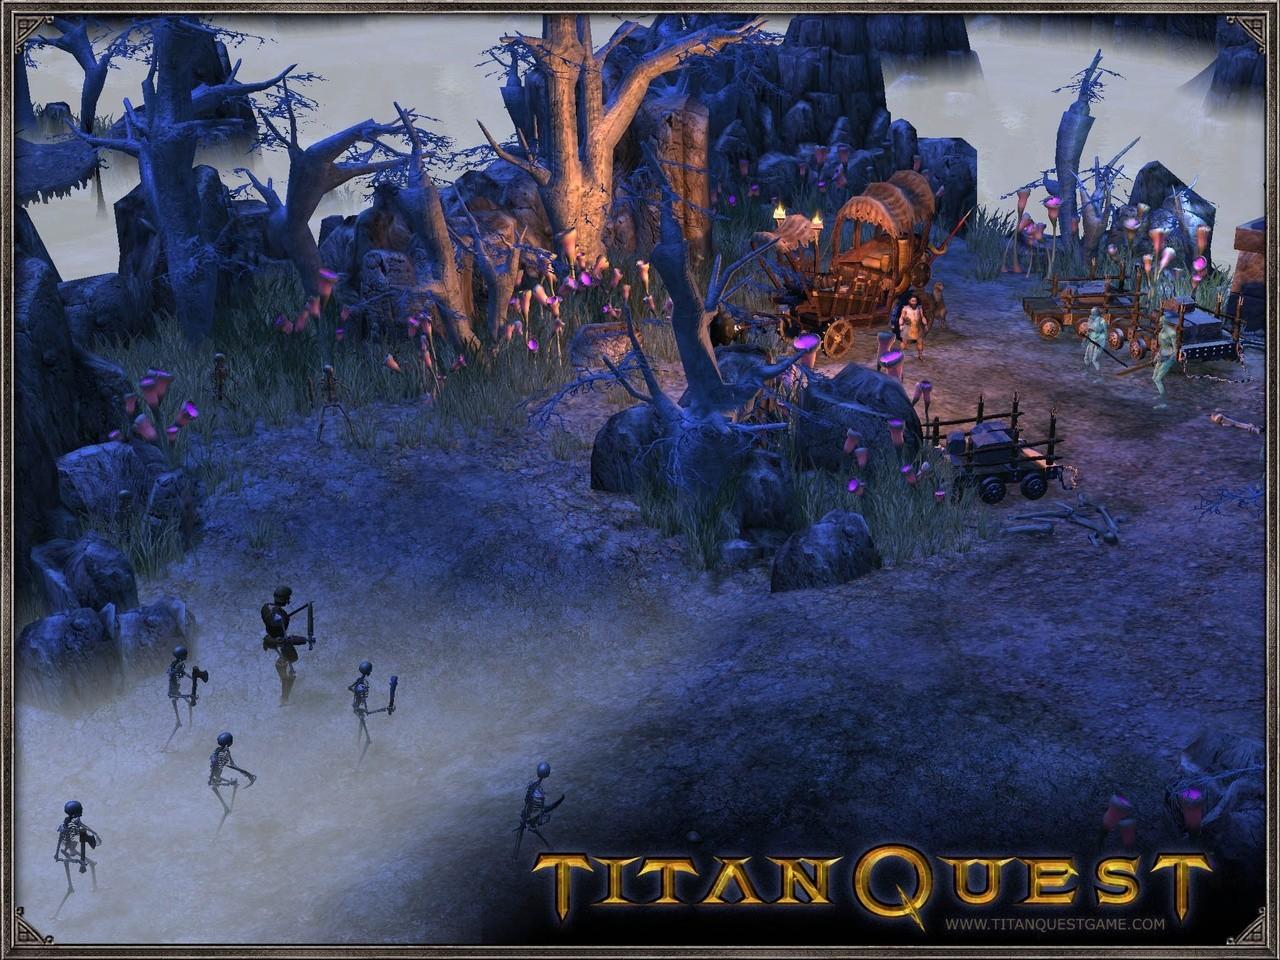 titan quest immortal throne patch 1.16